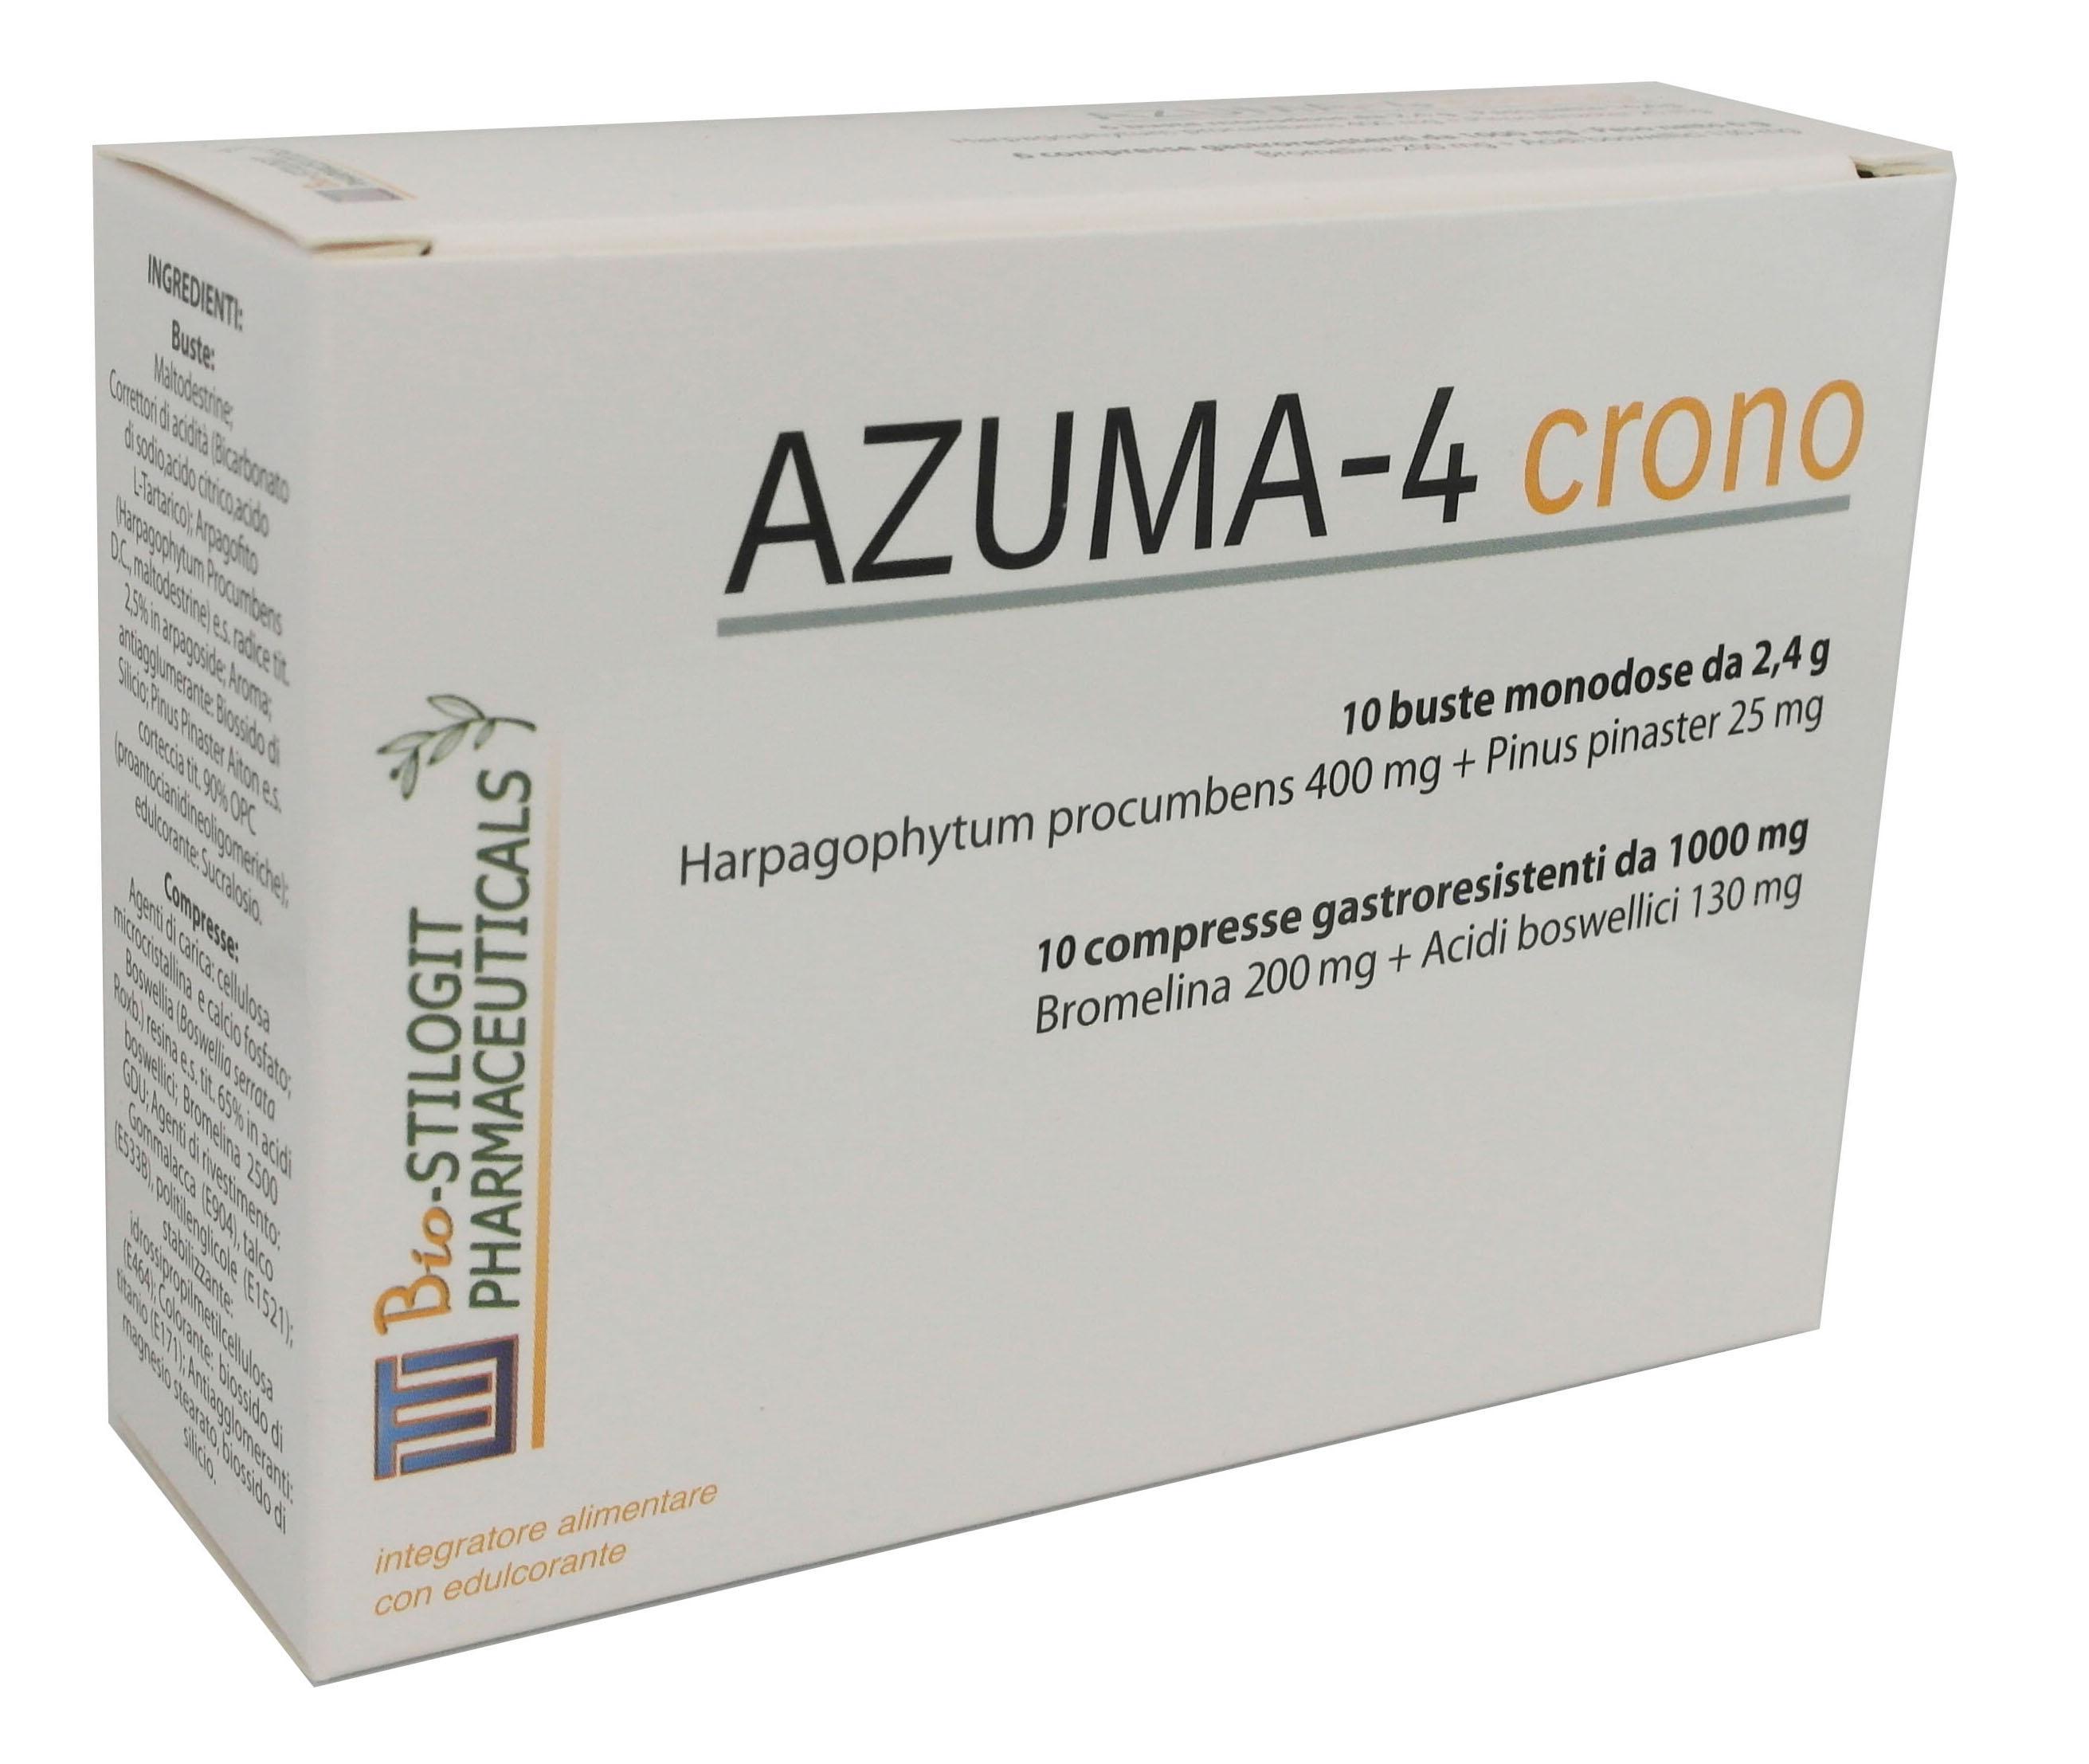 AZUMA-4 crono         -       10 cpr + 10 bustine